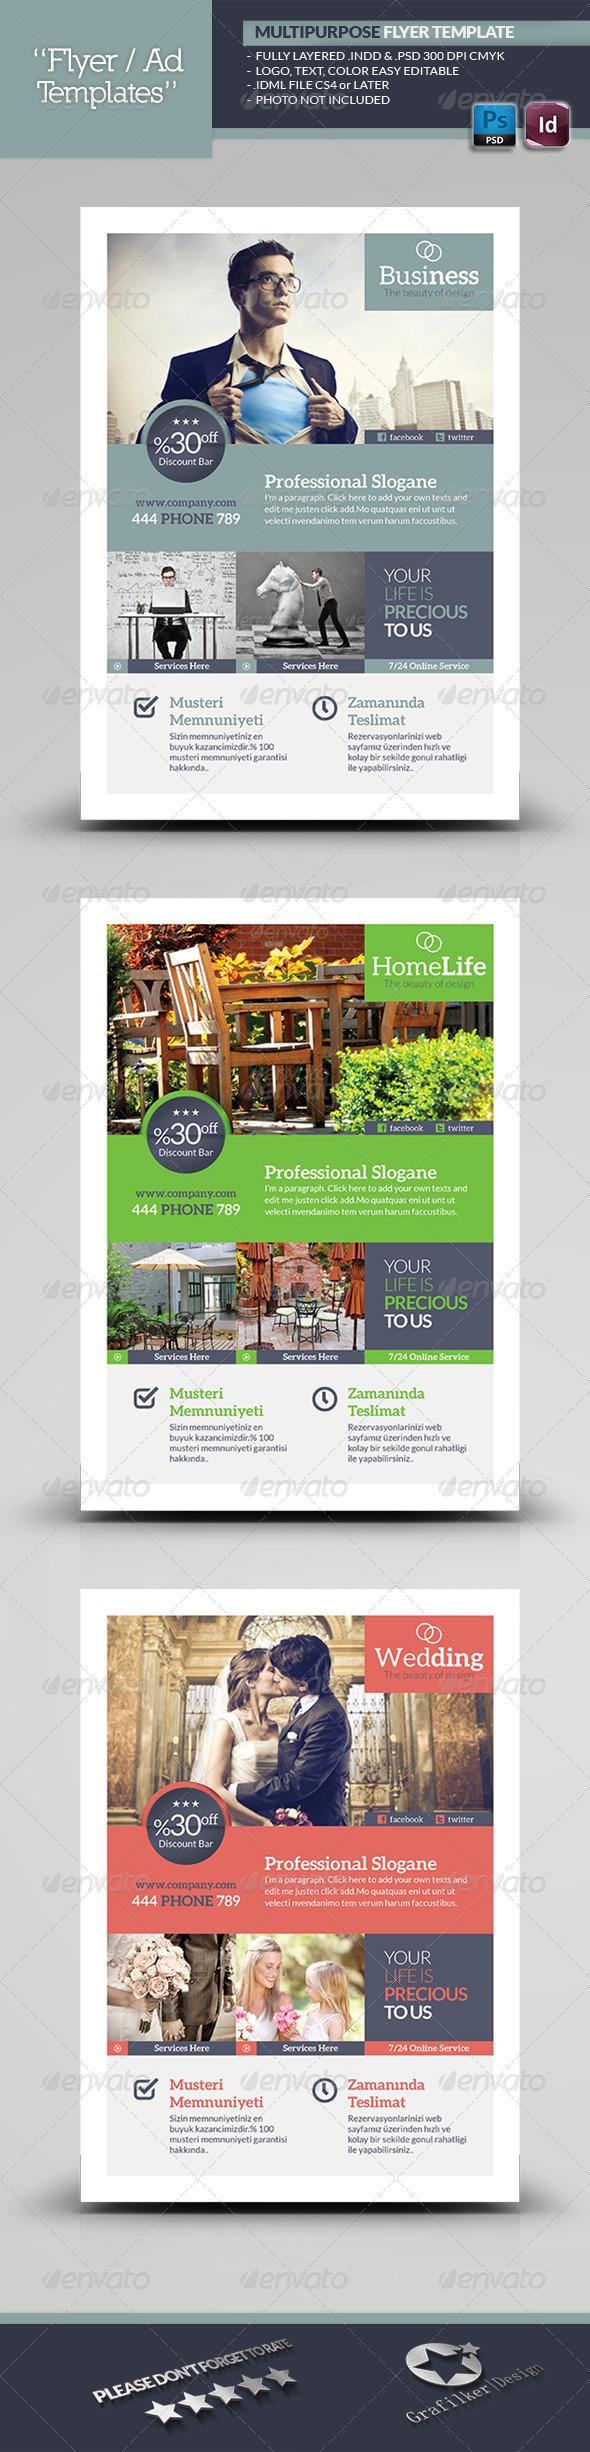 GraphicRiver Multipurpose Flyer Template 5661675